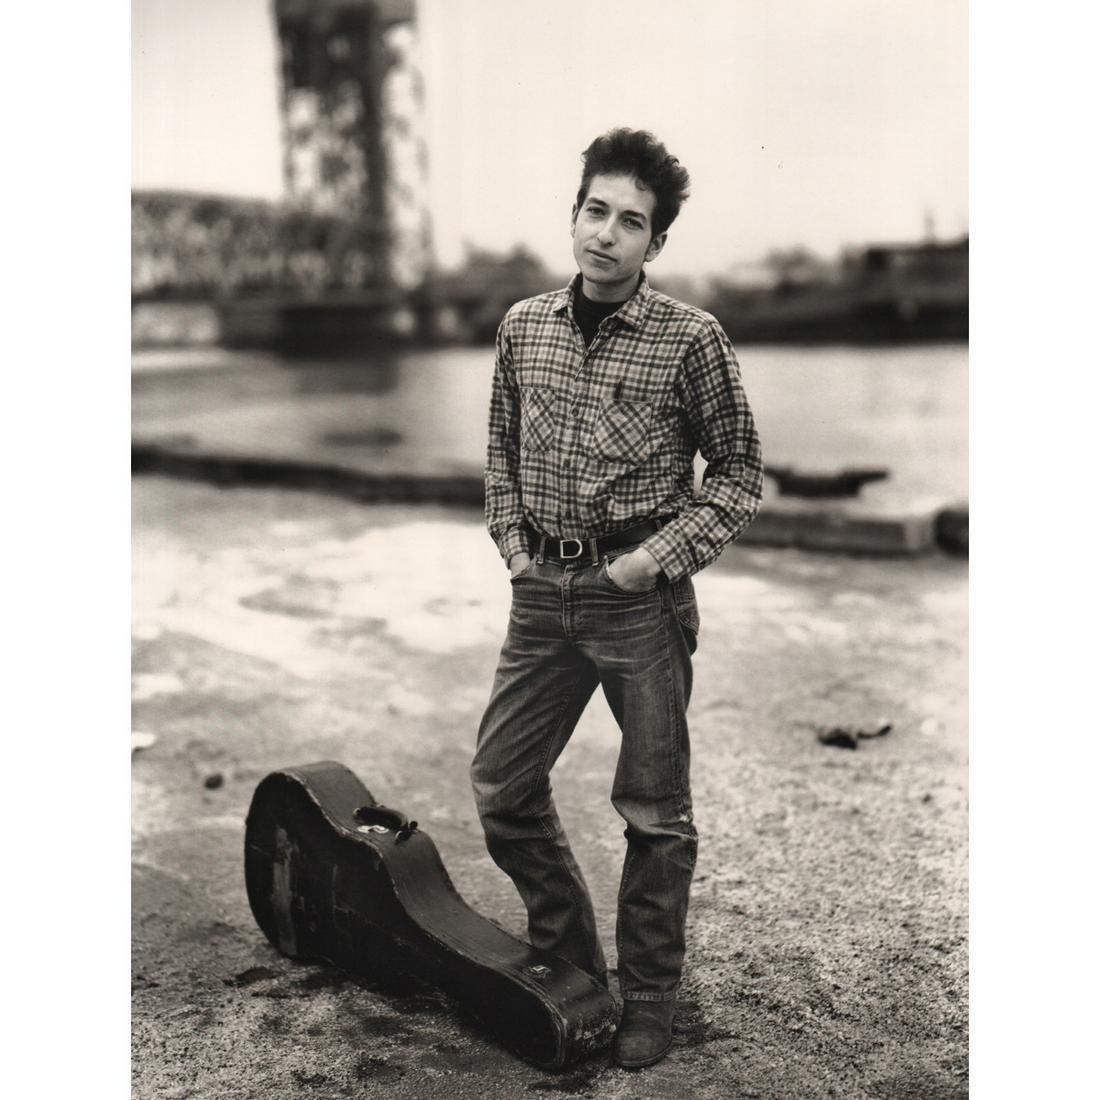 Richard Avedon - Bob Dylan, New York, 1963